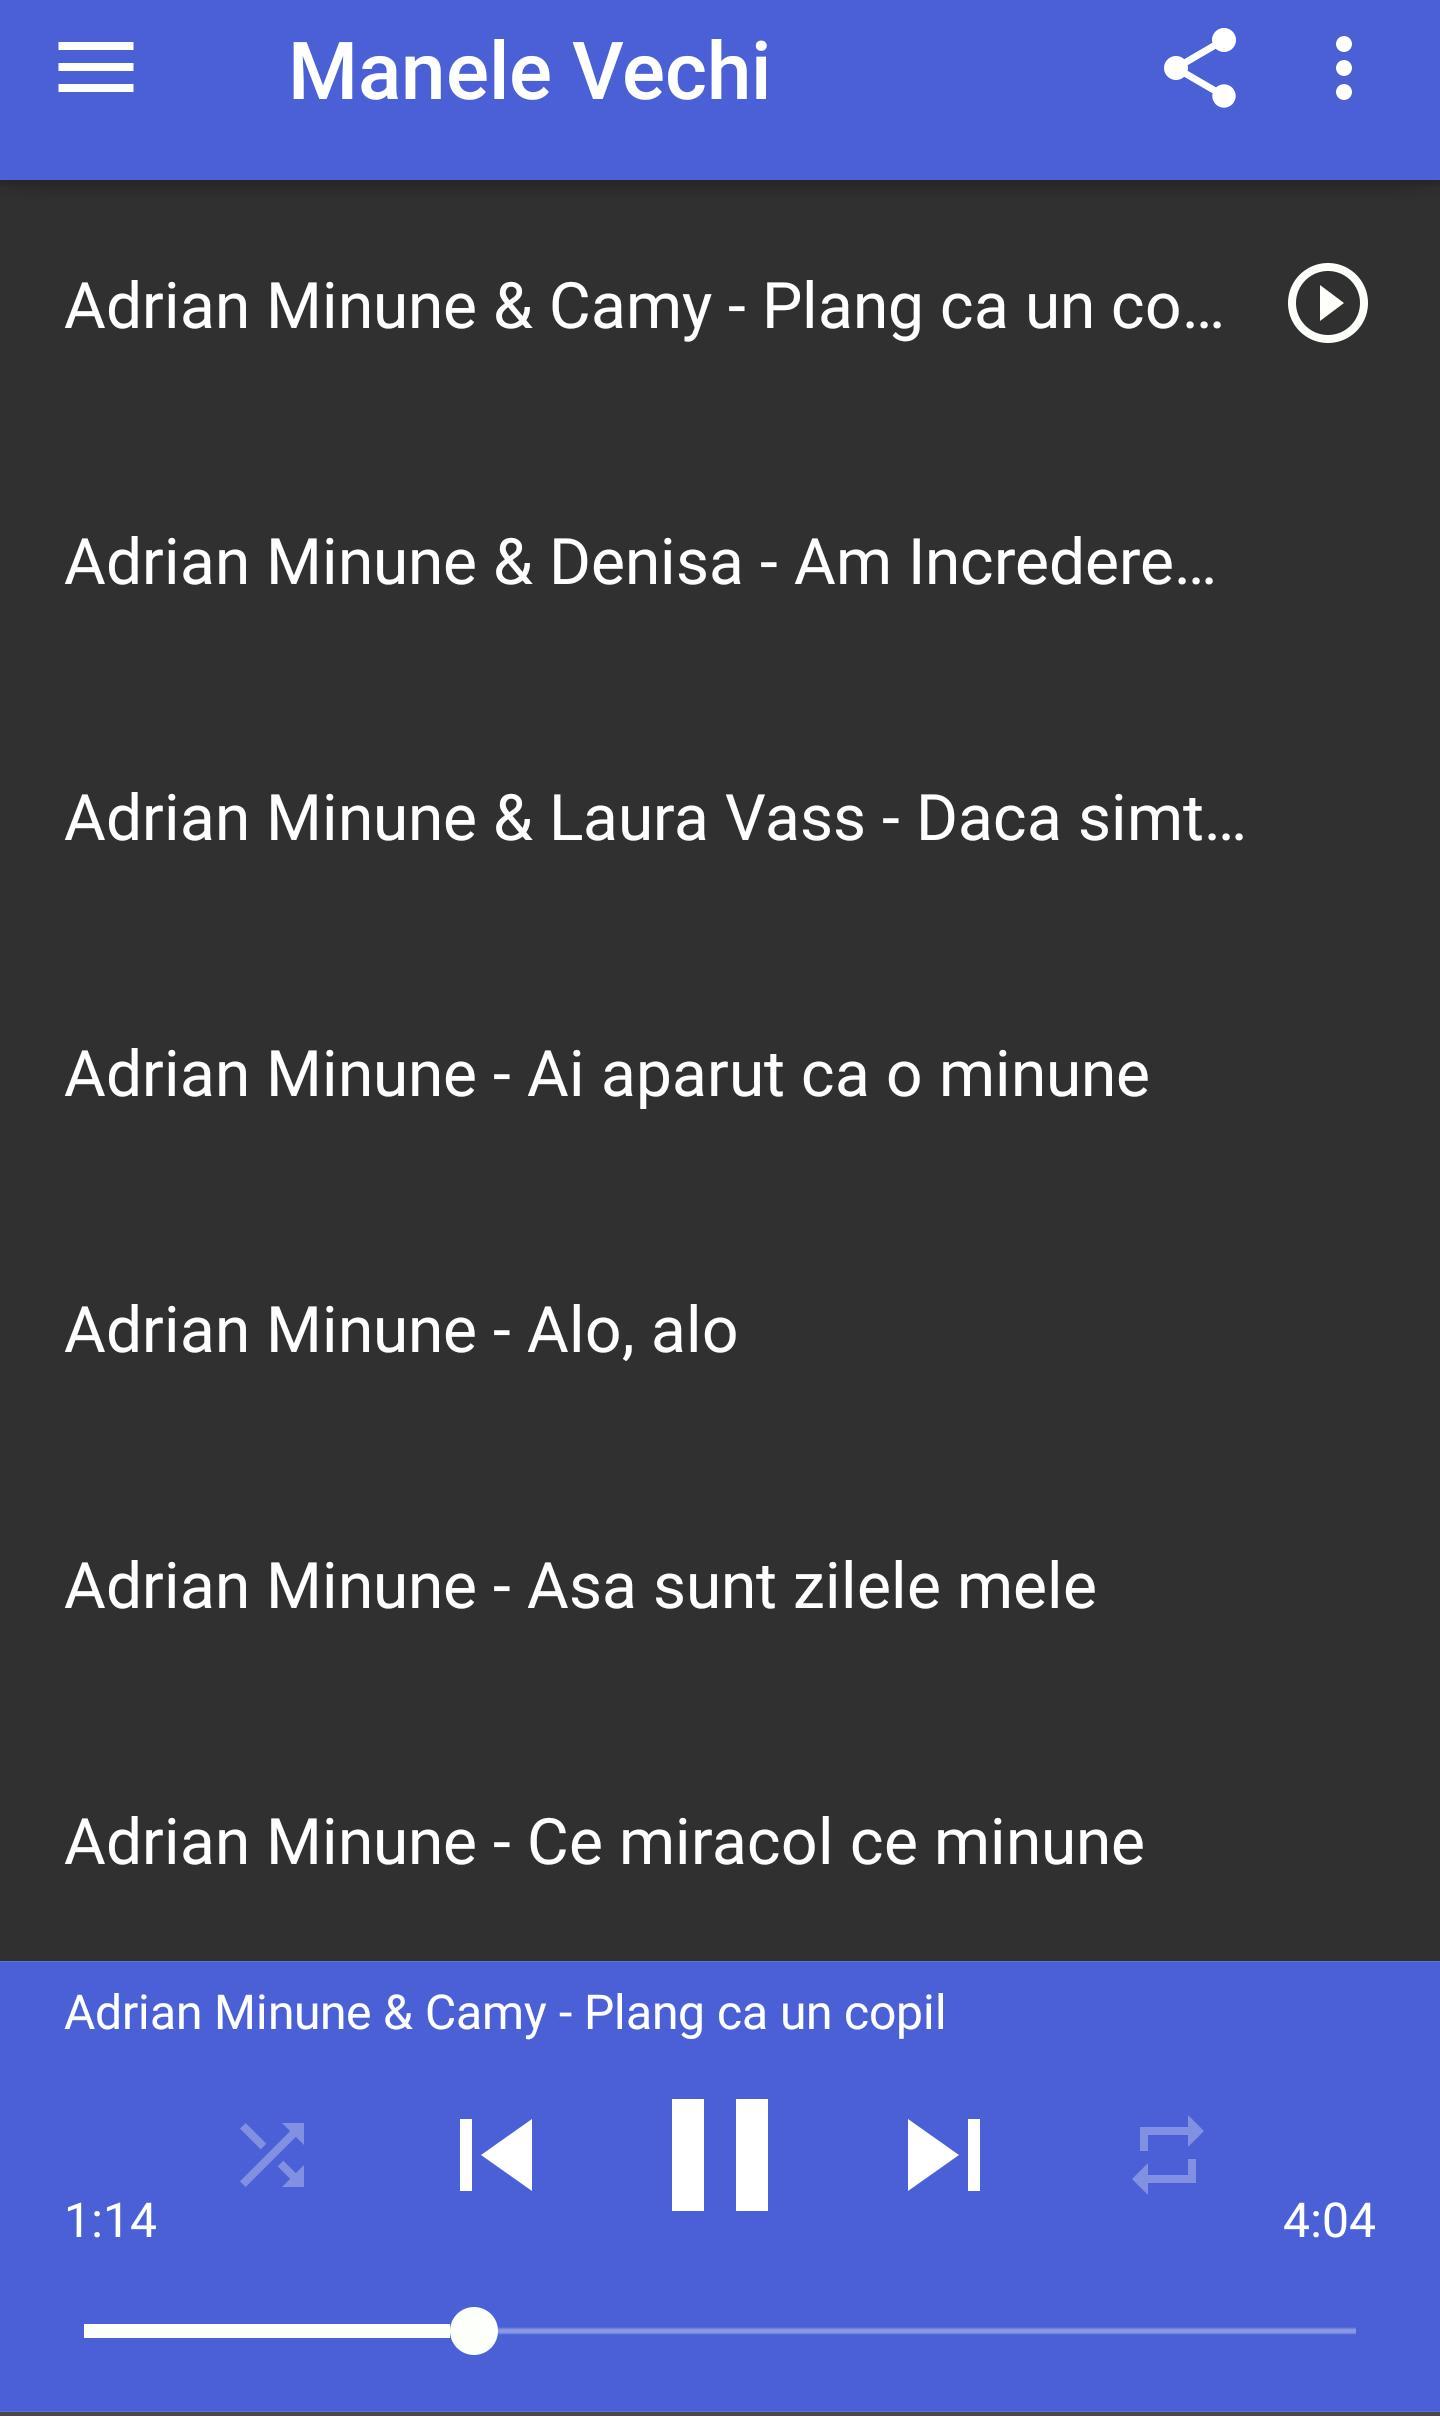 Adrian minune alo, alo youtube.